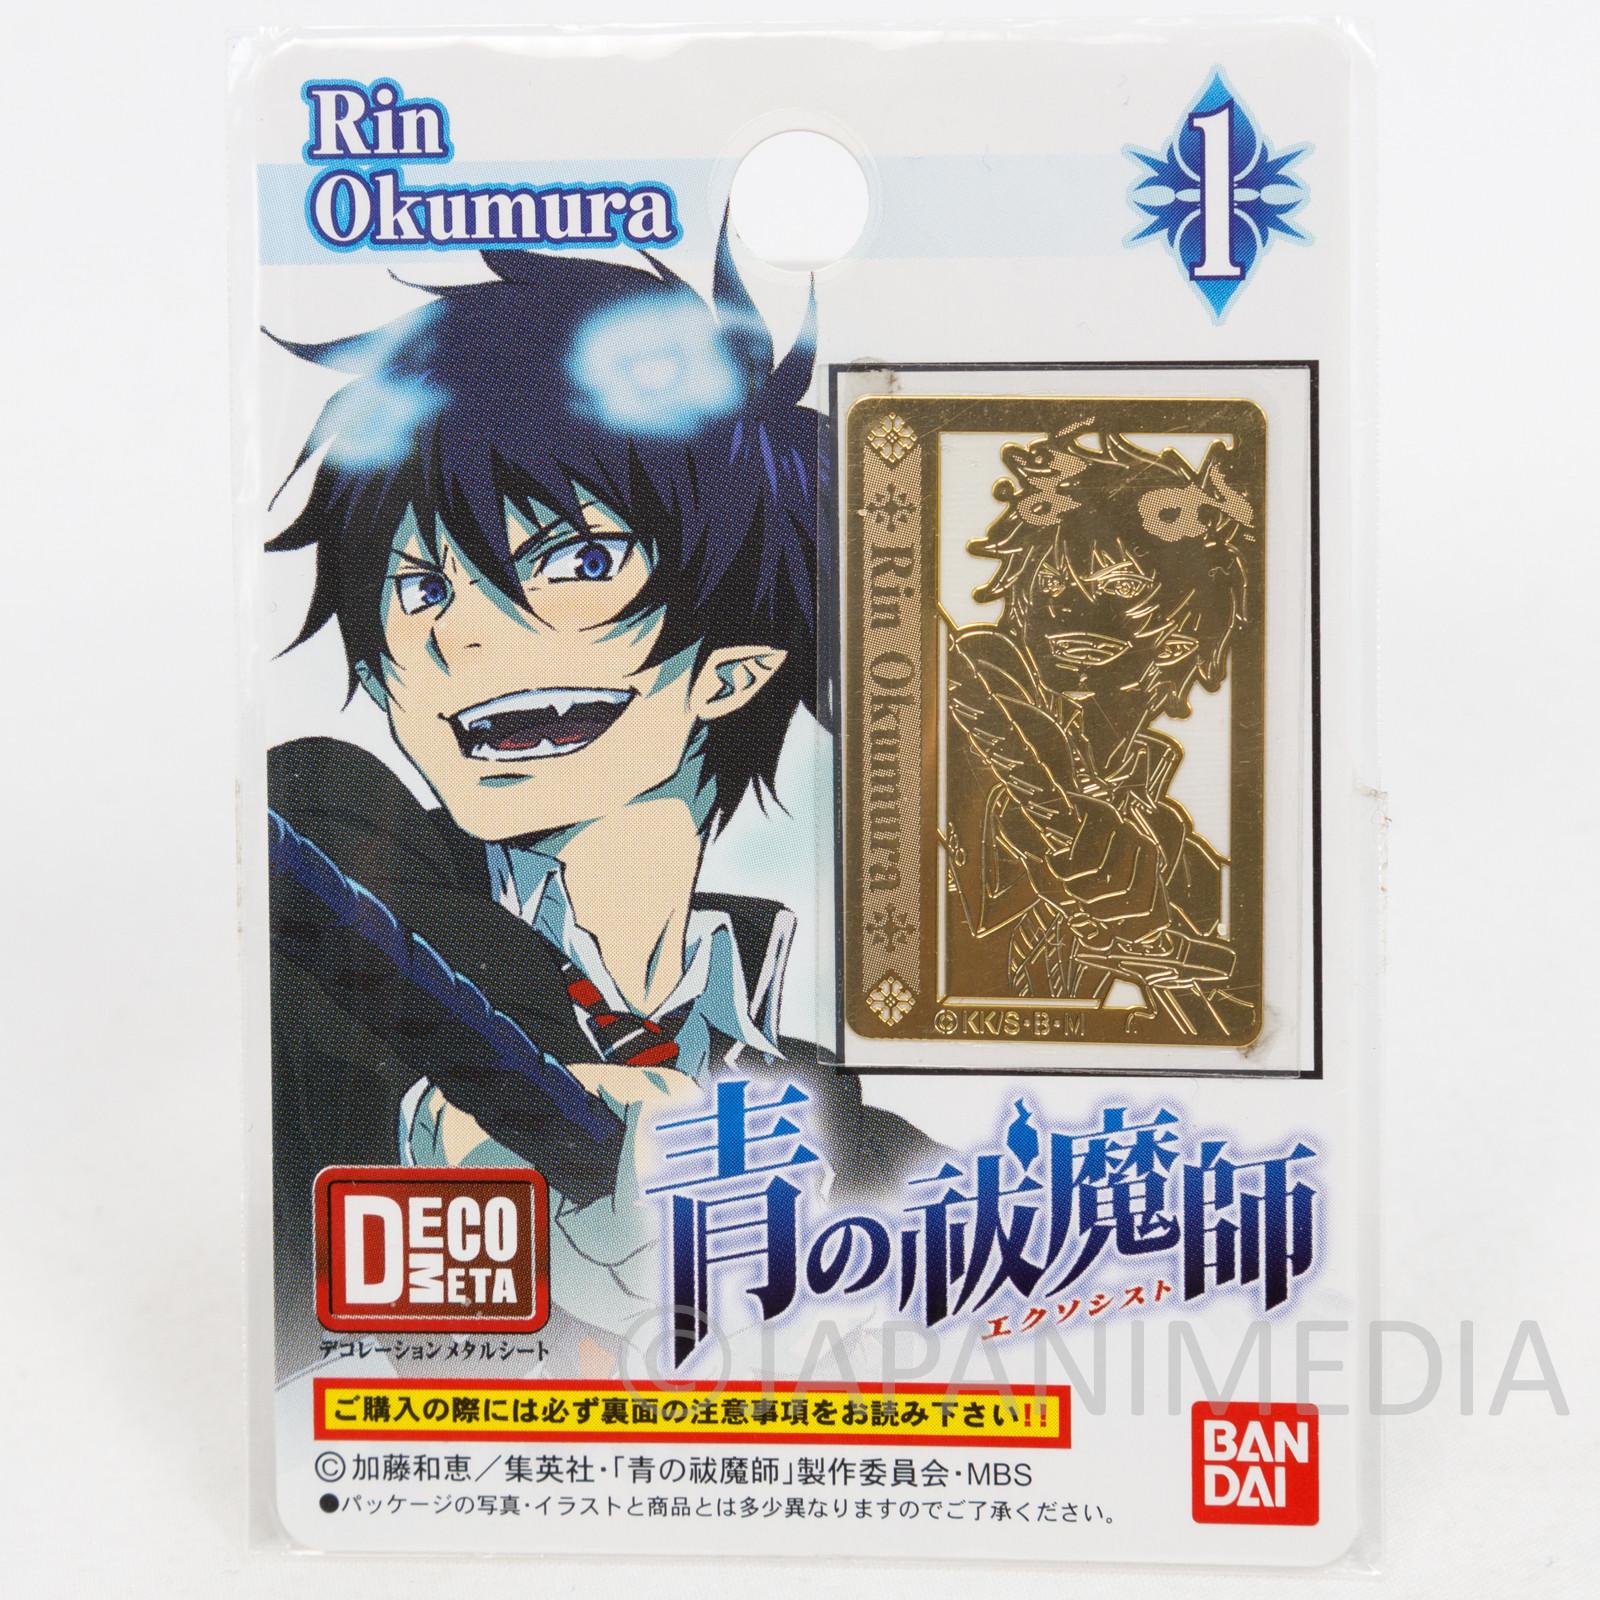 Blue Exorcist Rin Okumura DecoMeta Sticker BANDAI JAPAN ANIME